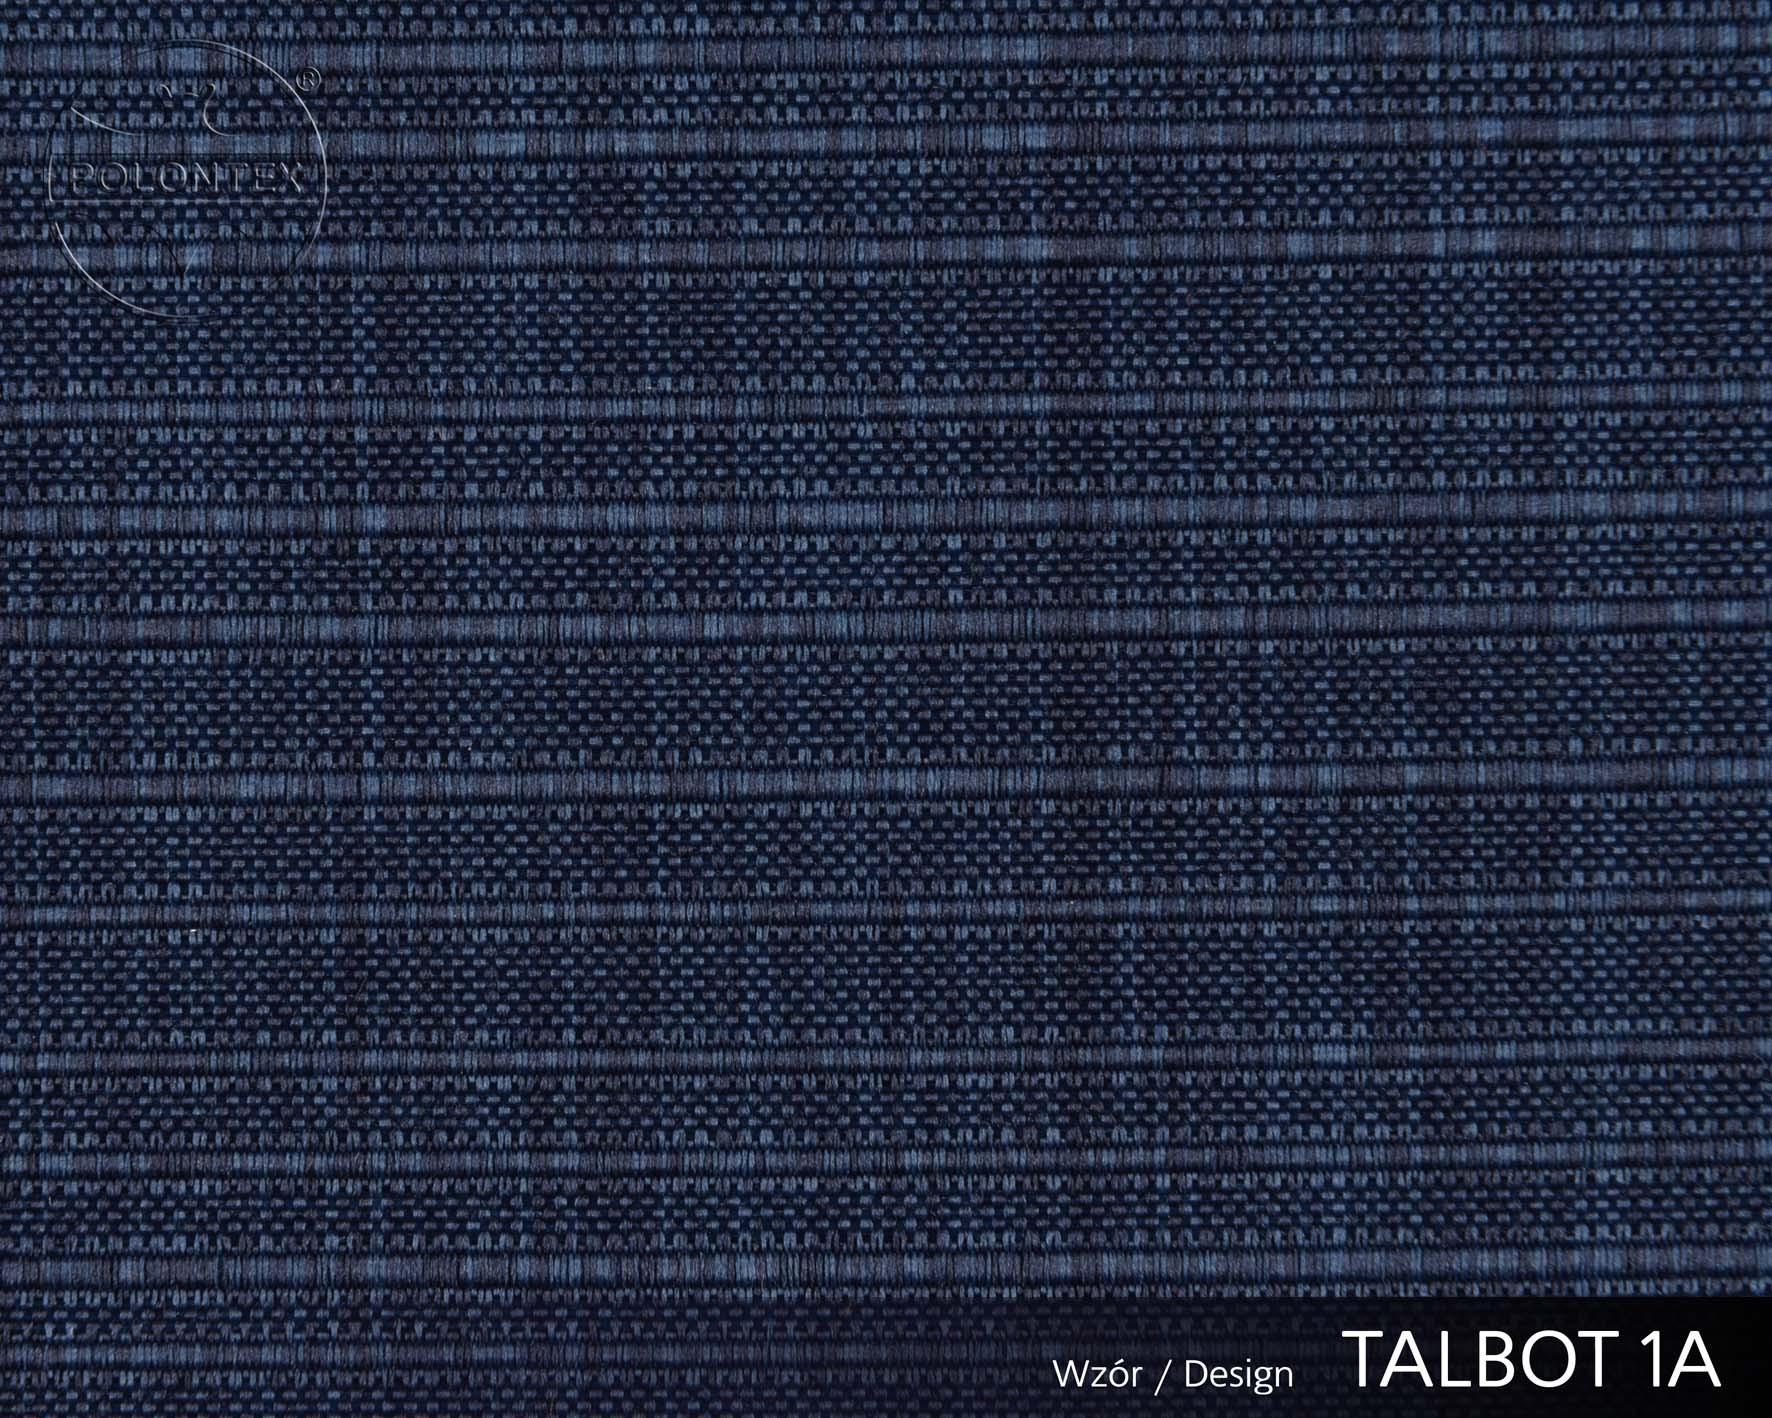 Talbot 1A 5279